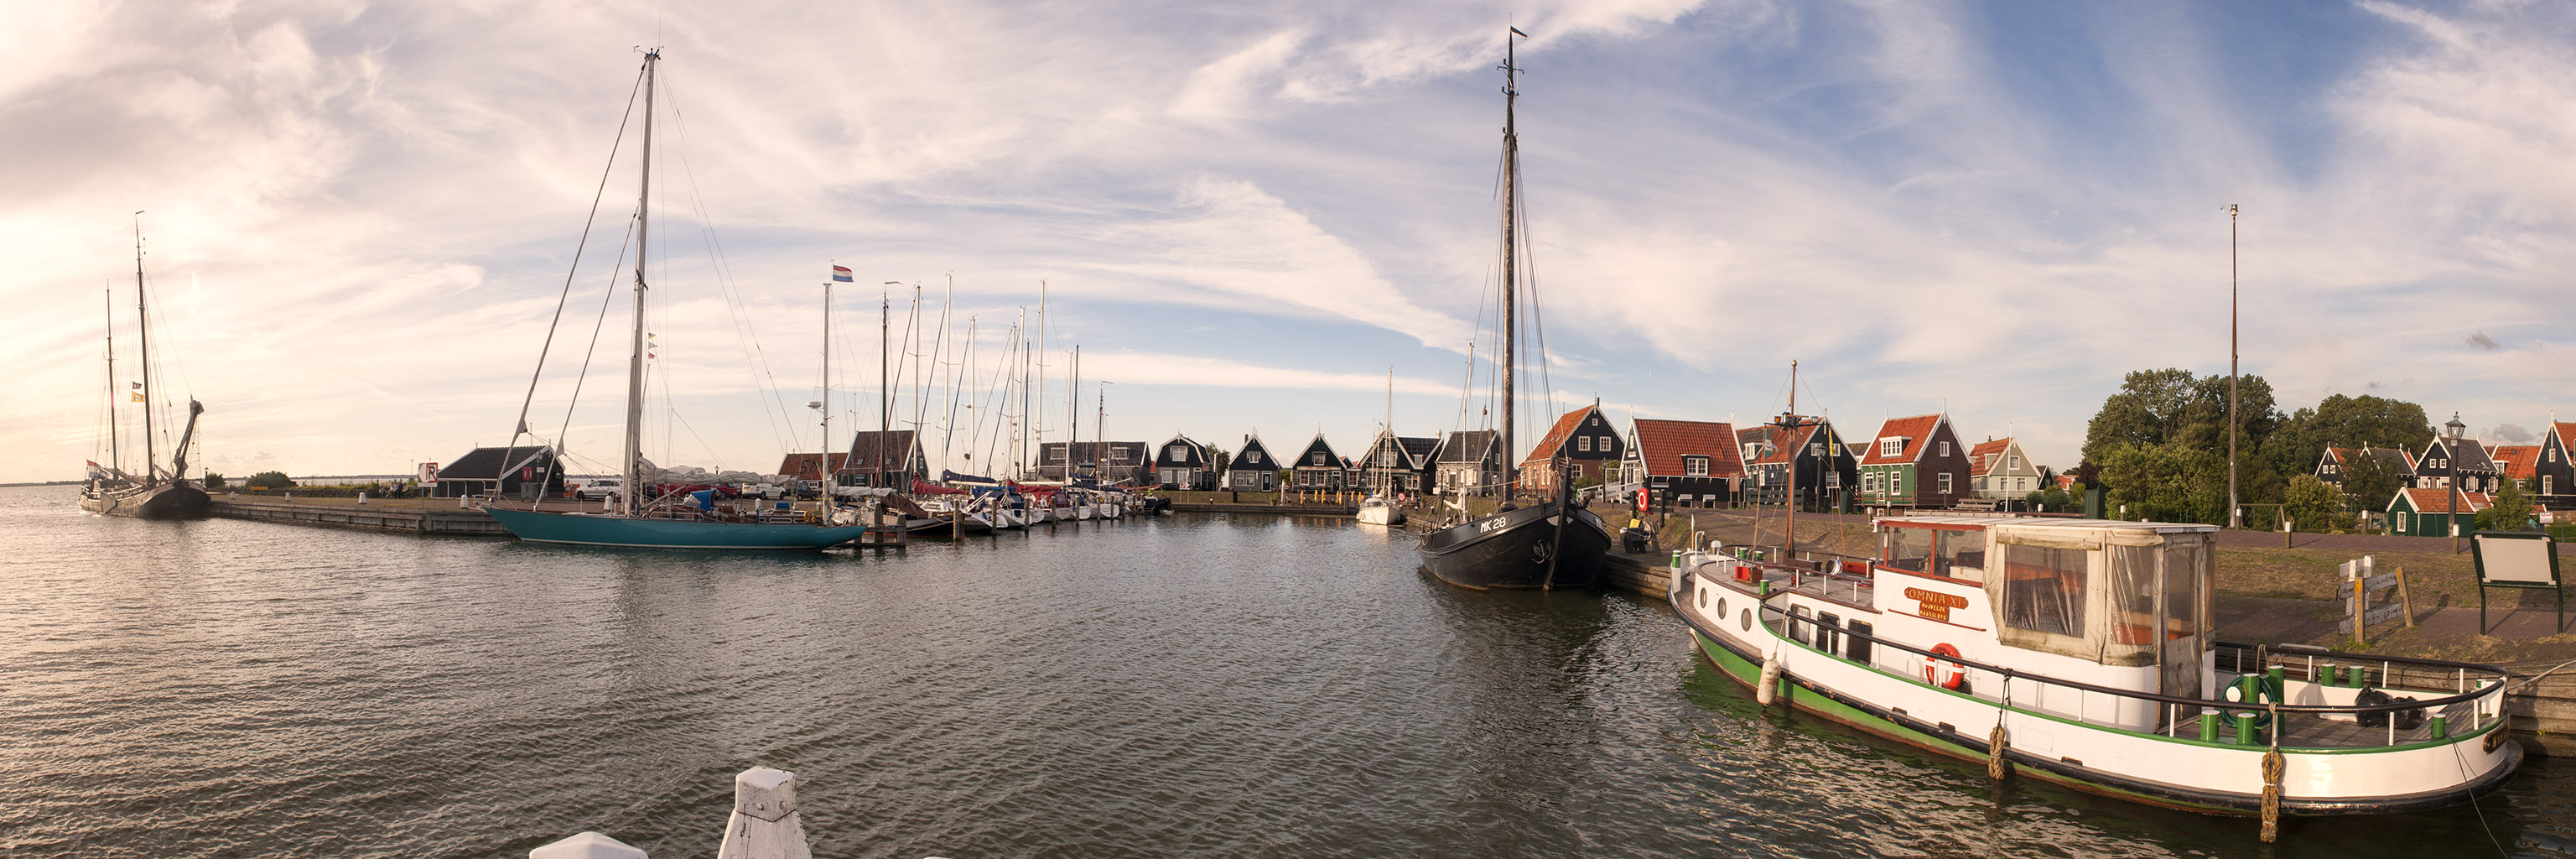 Panorama, The Netherlands